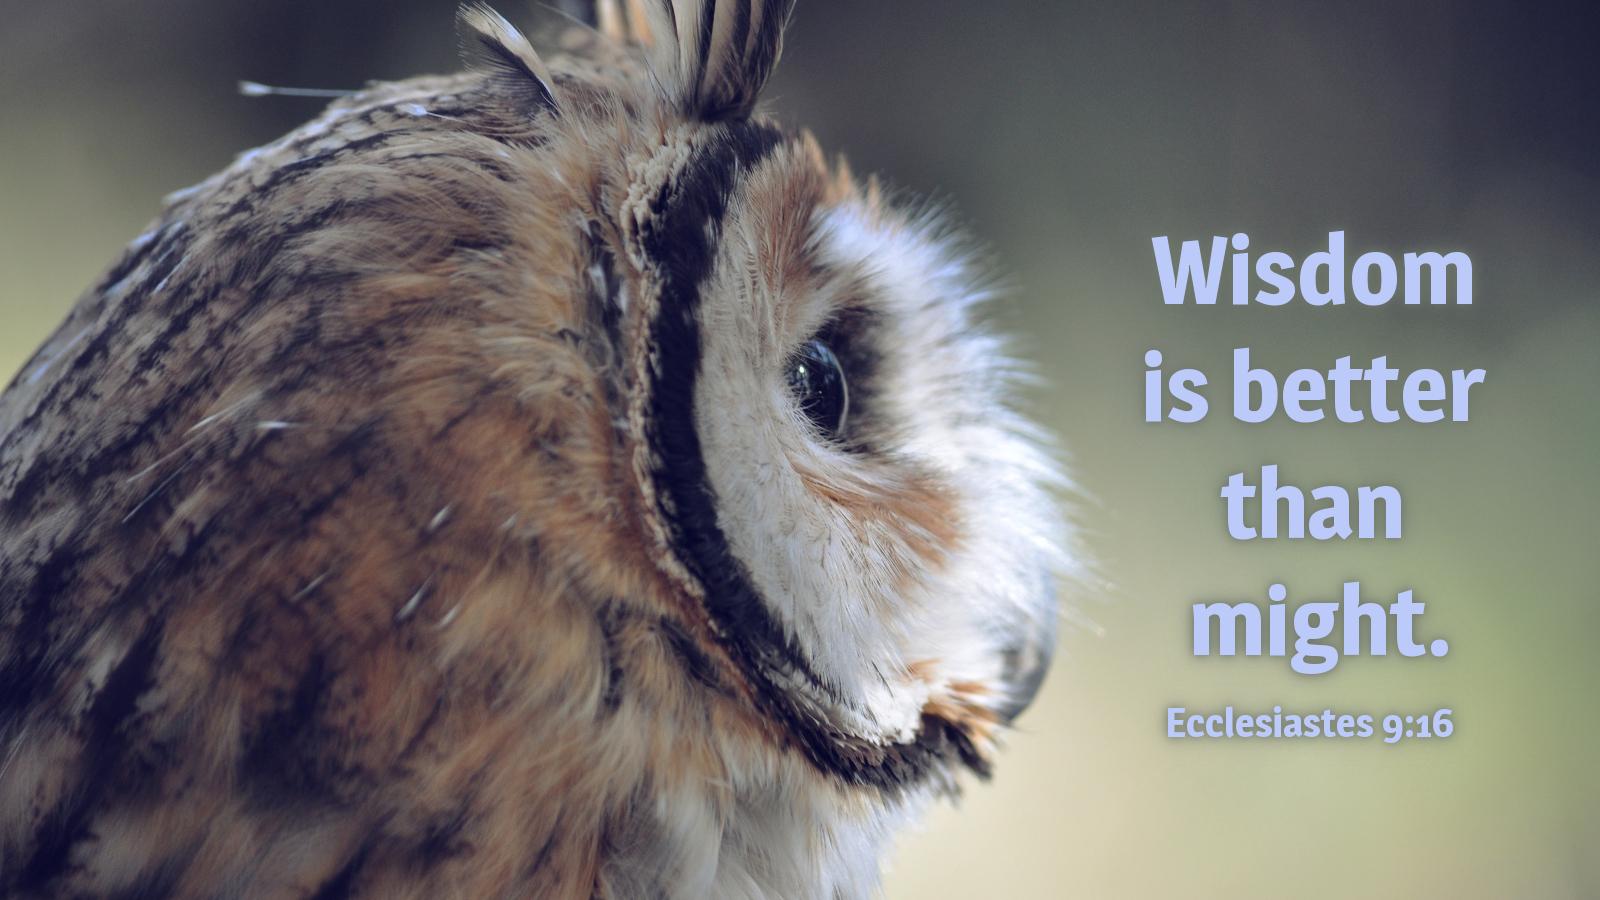 ecclesiastes9-16